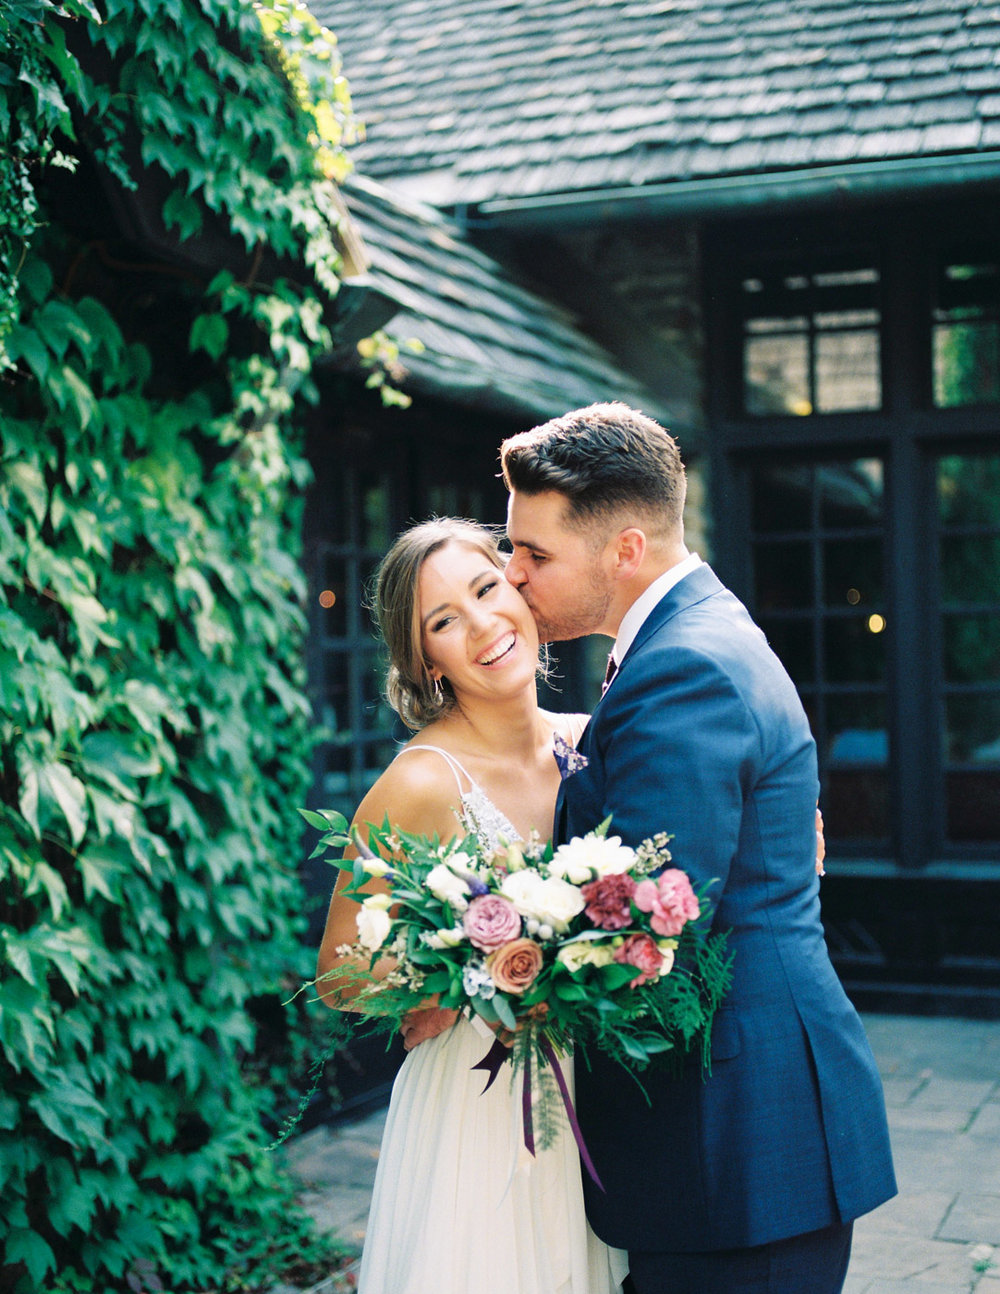 wedding_photography_tips_best_photography_lighting-16.jpg